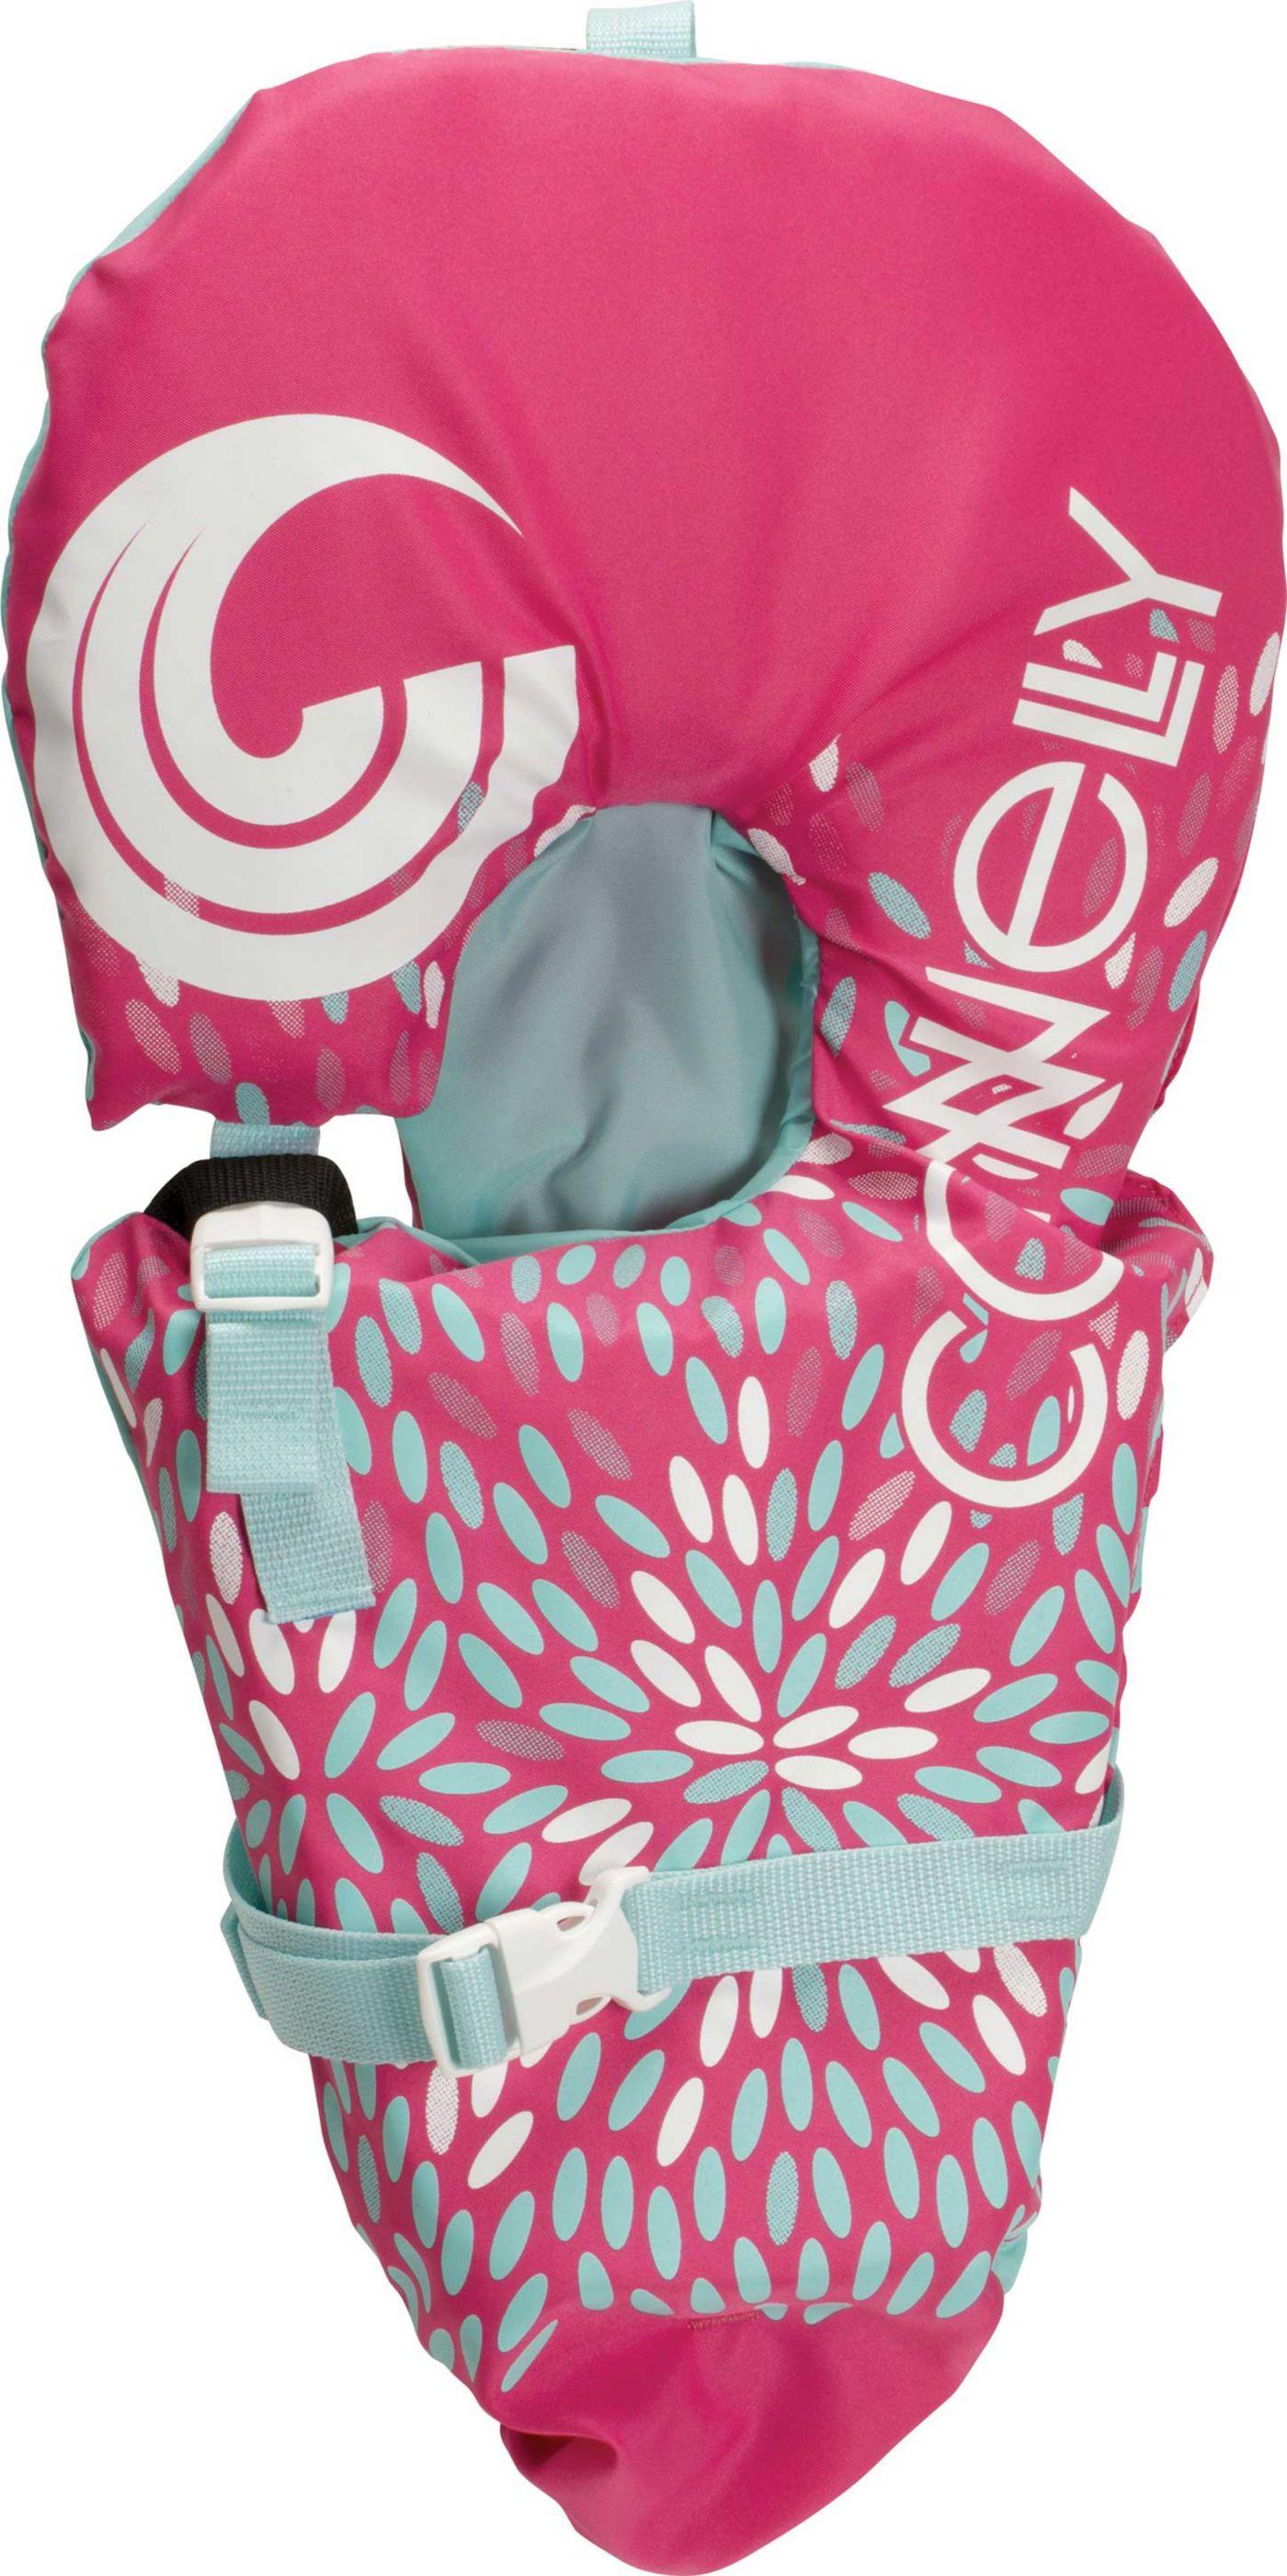 Connelly Baby Safe Nylon Life Vest